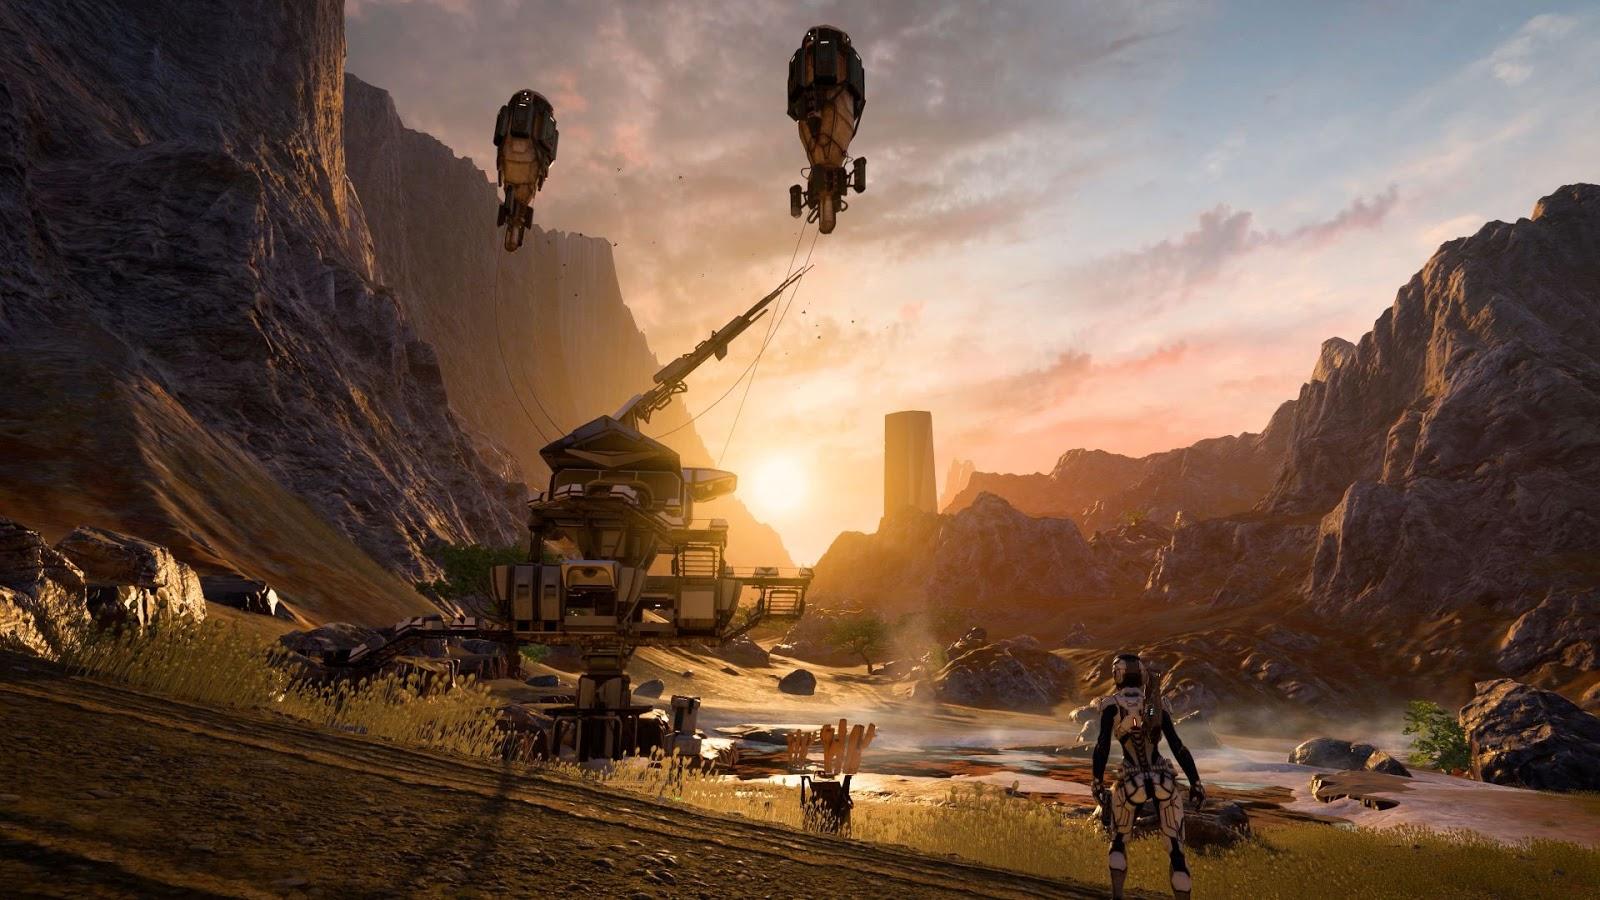 Mass Effect Andromeda ESPAÑOL PC Full + Update 1.0.0.5 + CRACKFIX (CPY) + REPACK PROPER 9 DVD5 (JPW) 2